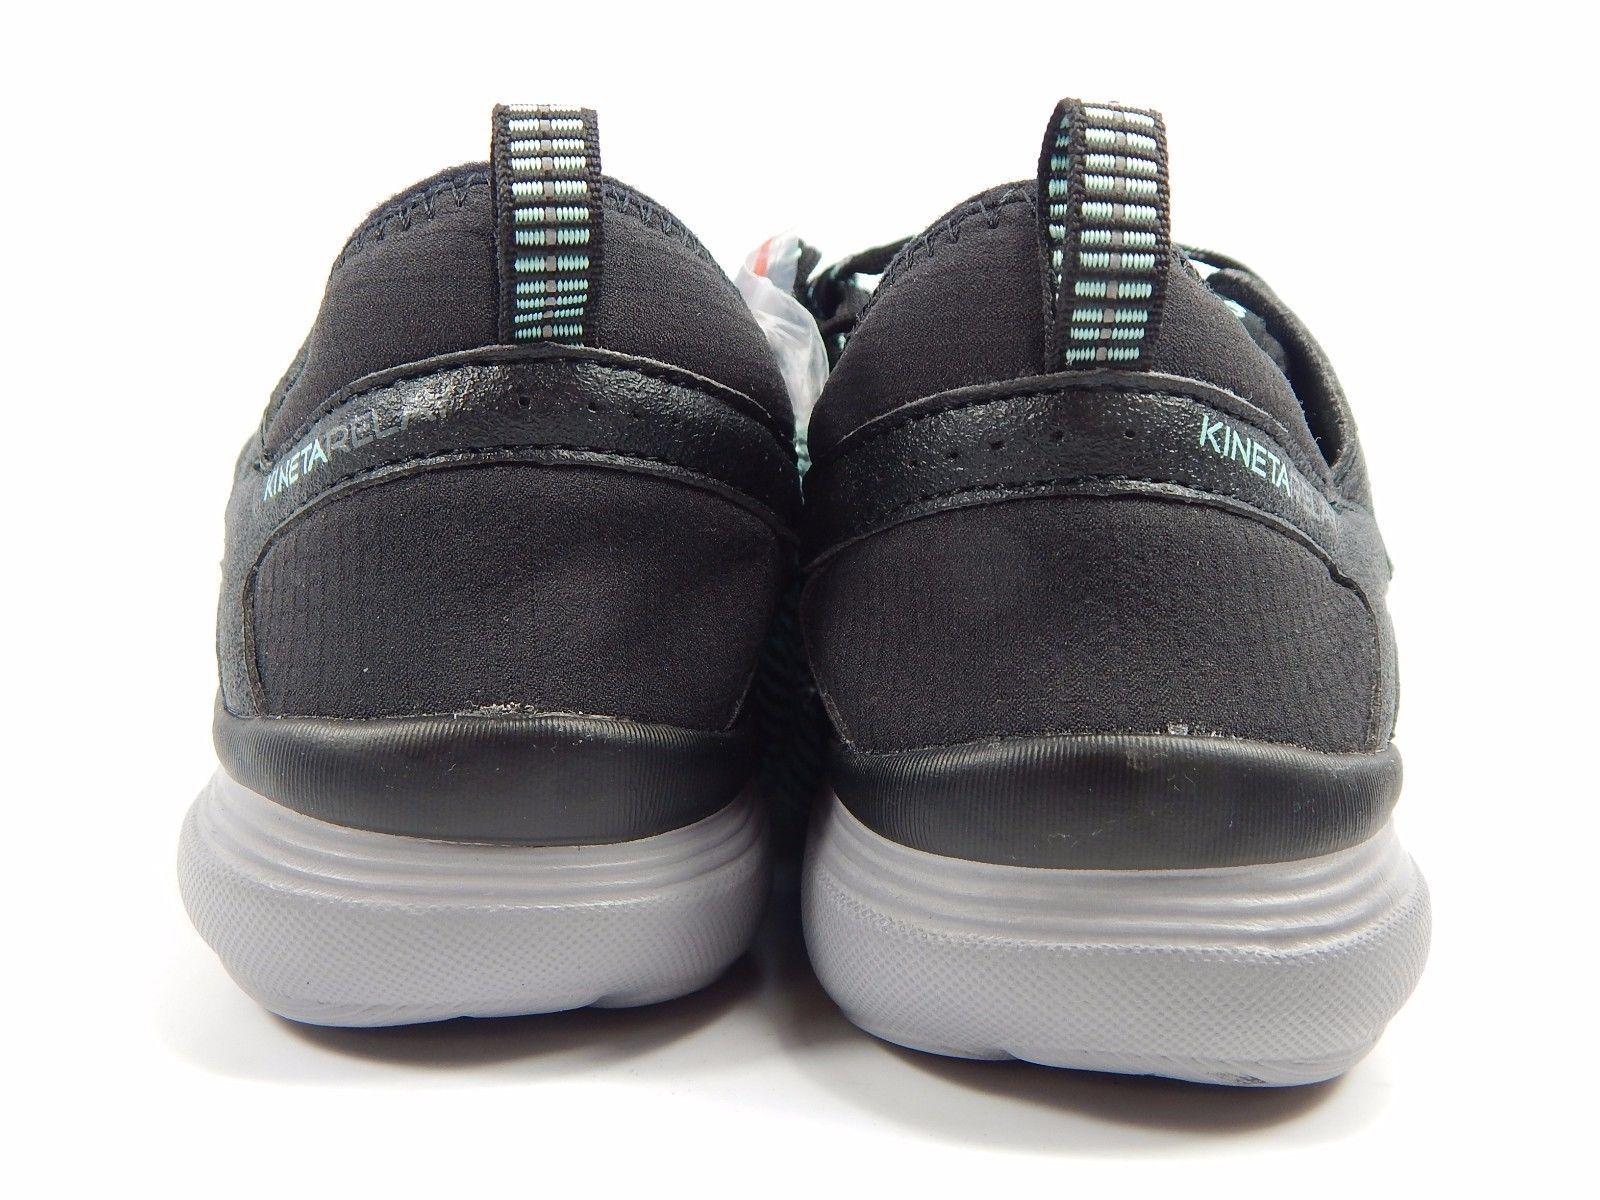 Saucony Kineta Relay Runshield Womens Running Shoes Sz US 7 M (B) EU 38 S15271-1